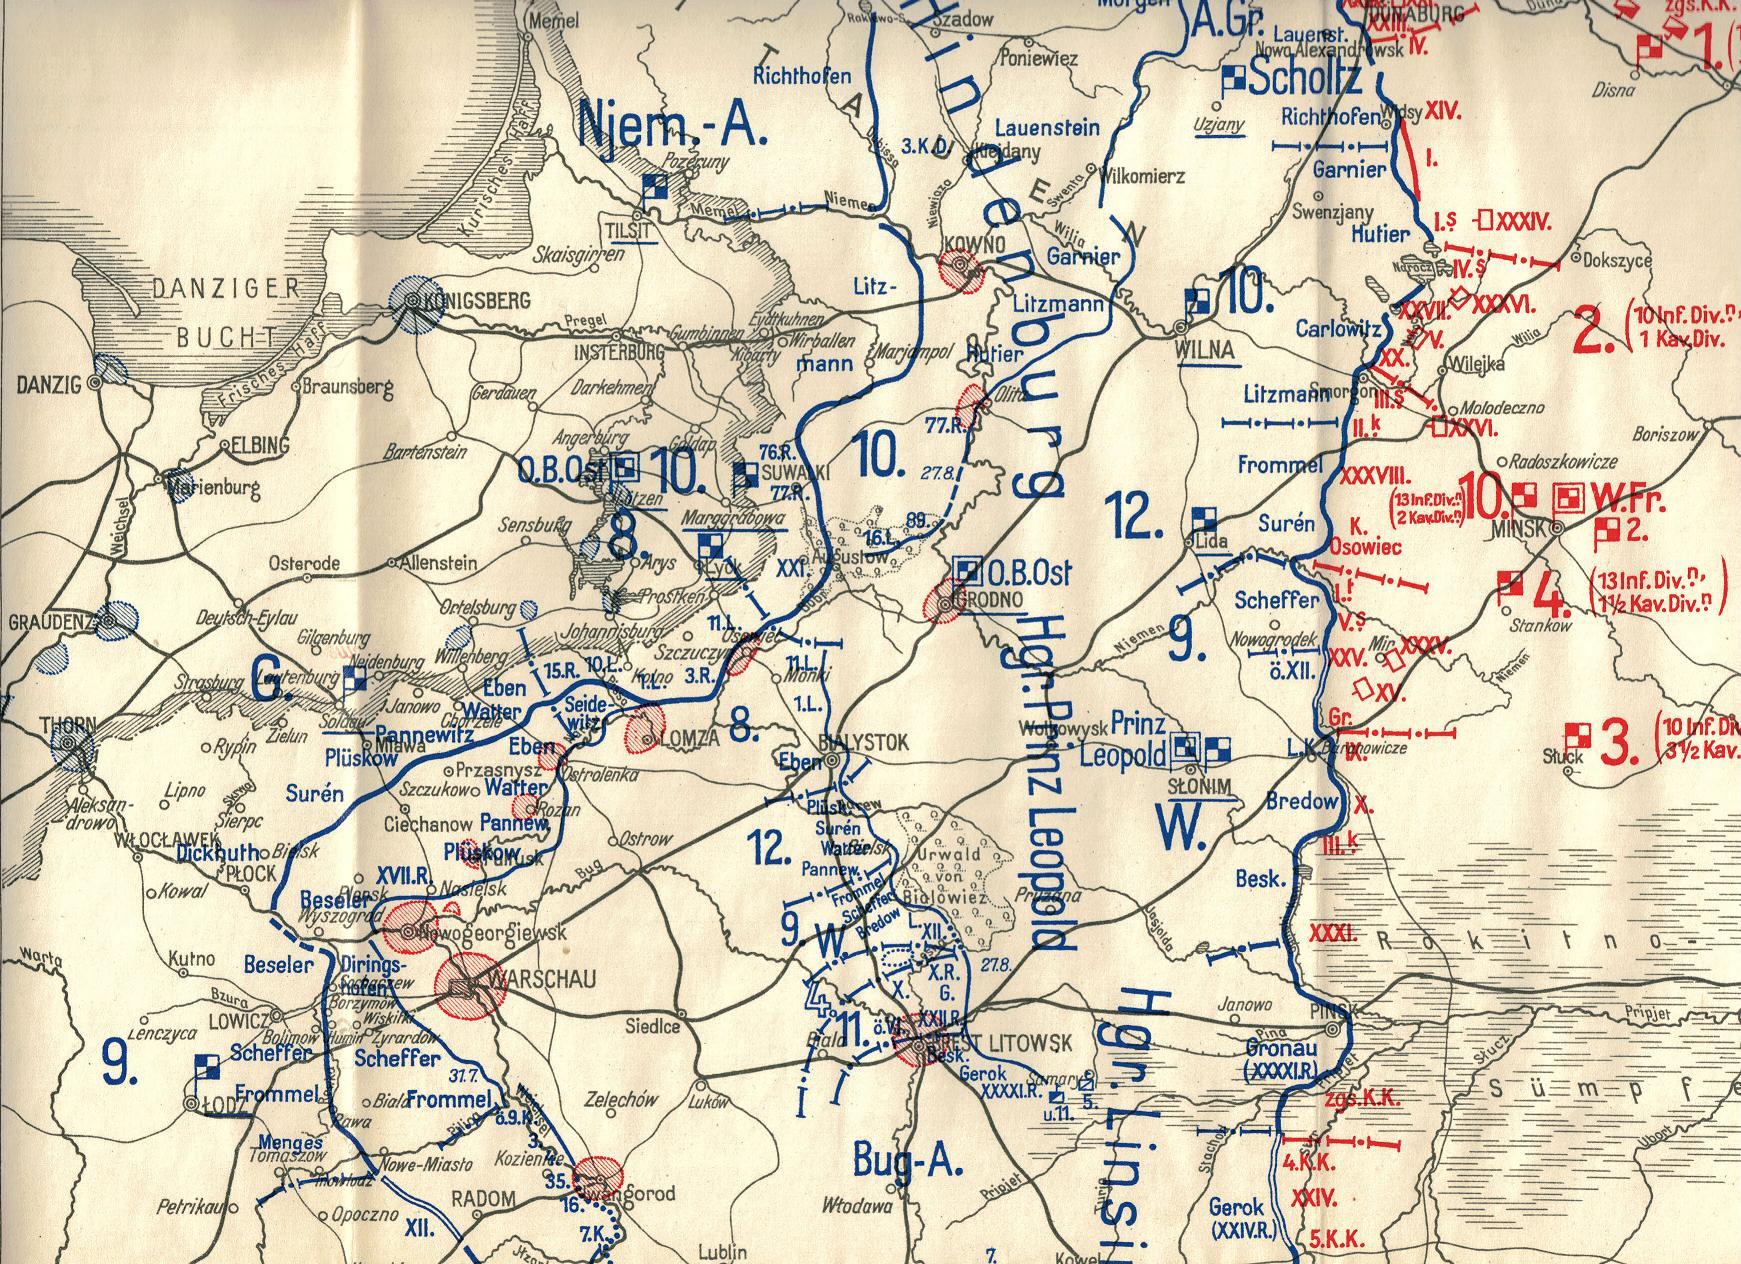 26. august 1915: Overblik over kampene på Østfronten i juli og august